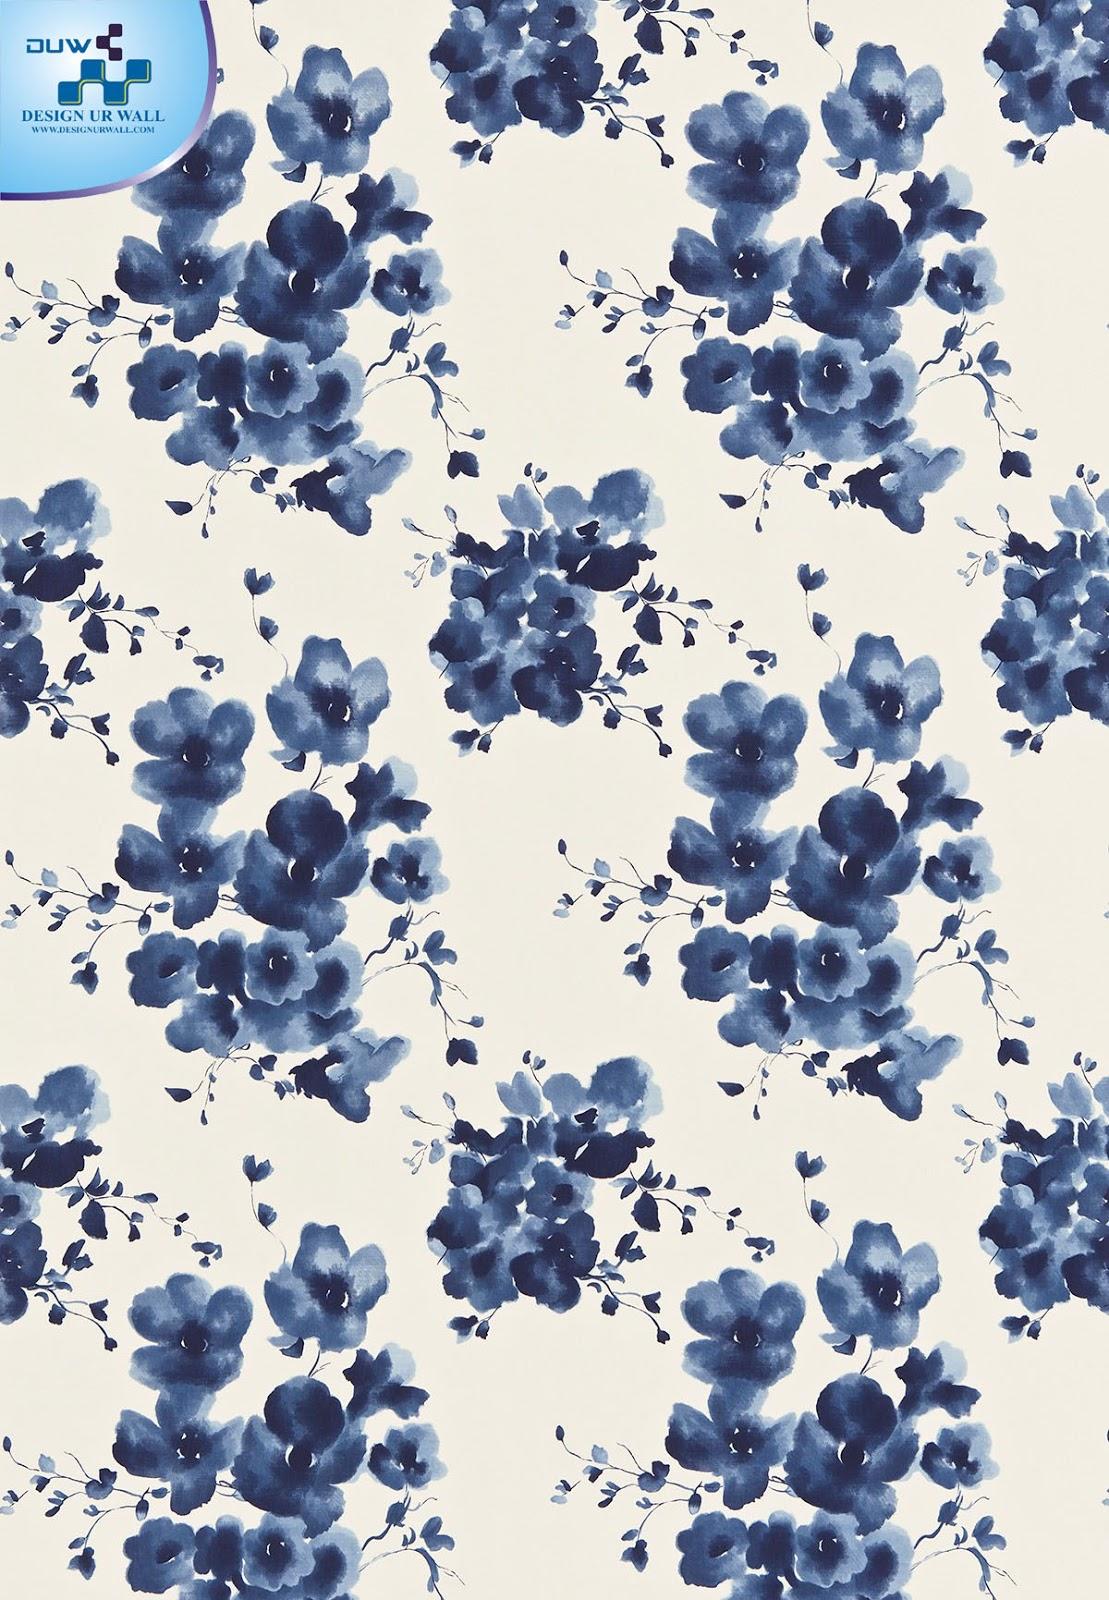 Imported Wallpaper Merchant: Designer Wallpaper Designs In